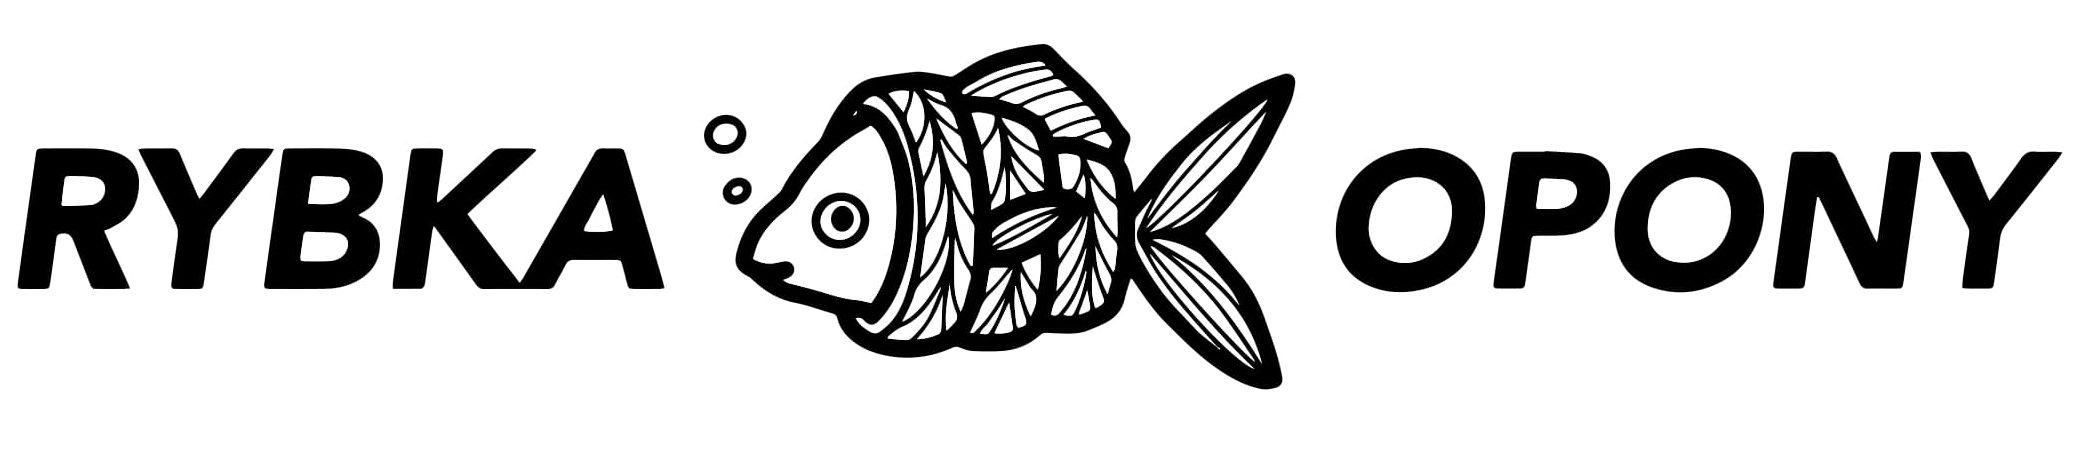 Rybka Opony